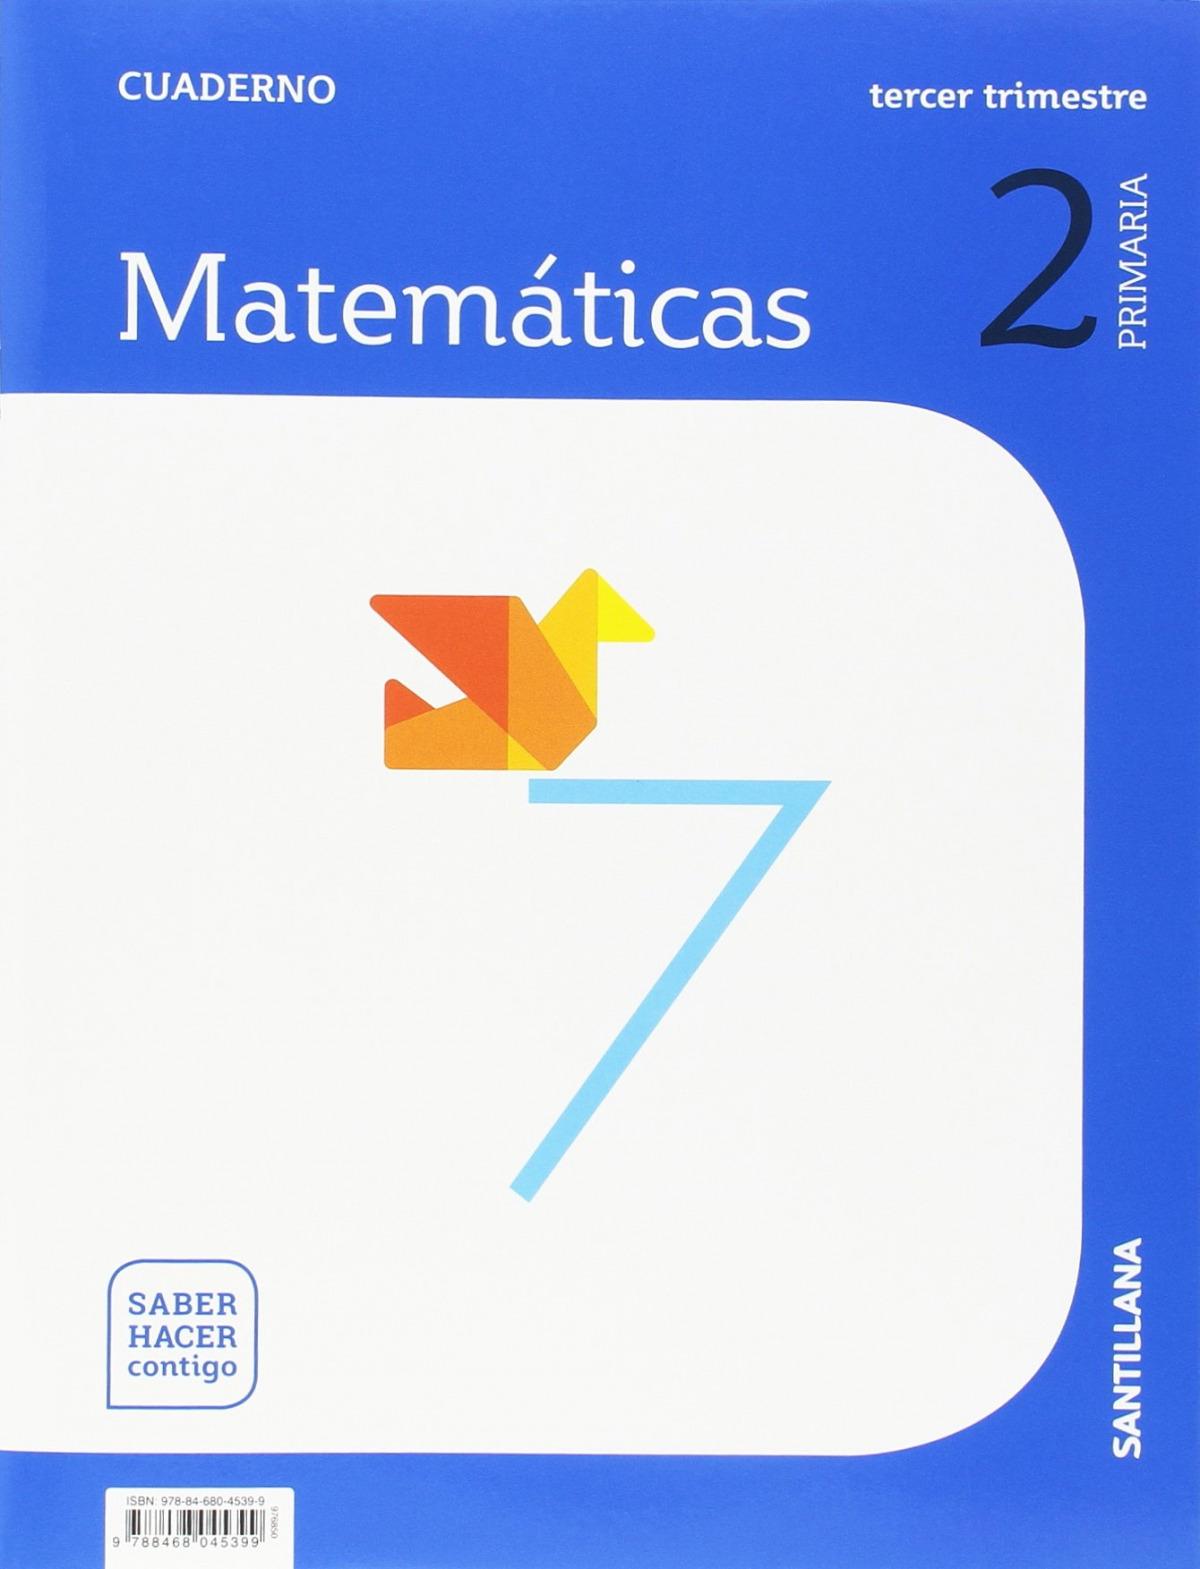 CUADERNO MATEMÁTICAS 3-2o.PRIMARIA. SABER HACER CONTIGO 9788468045399